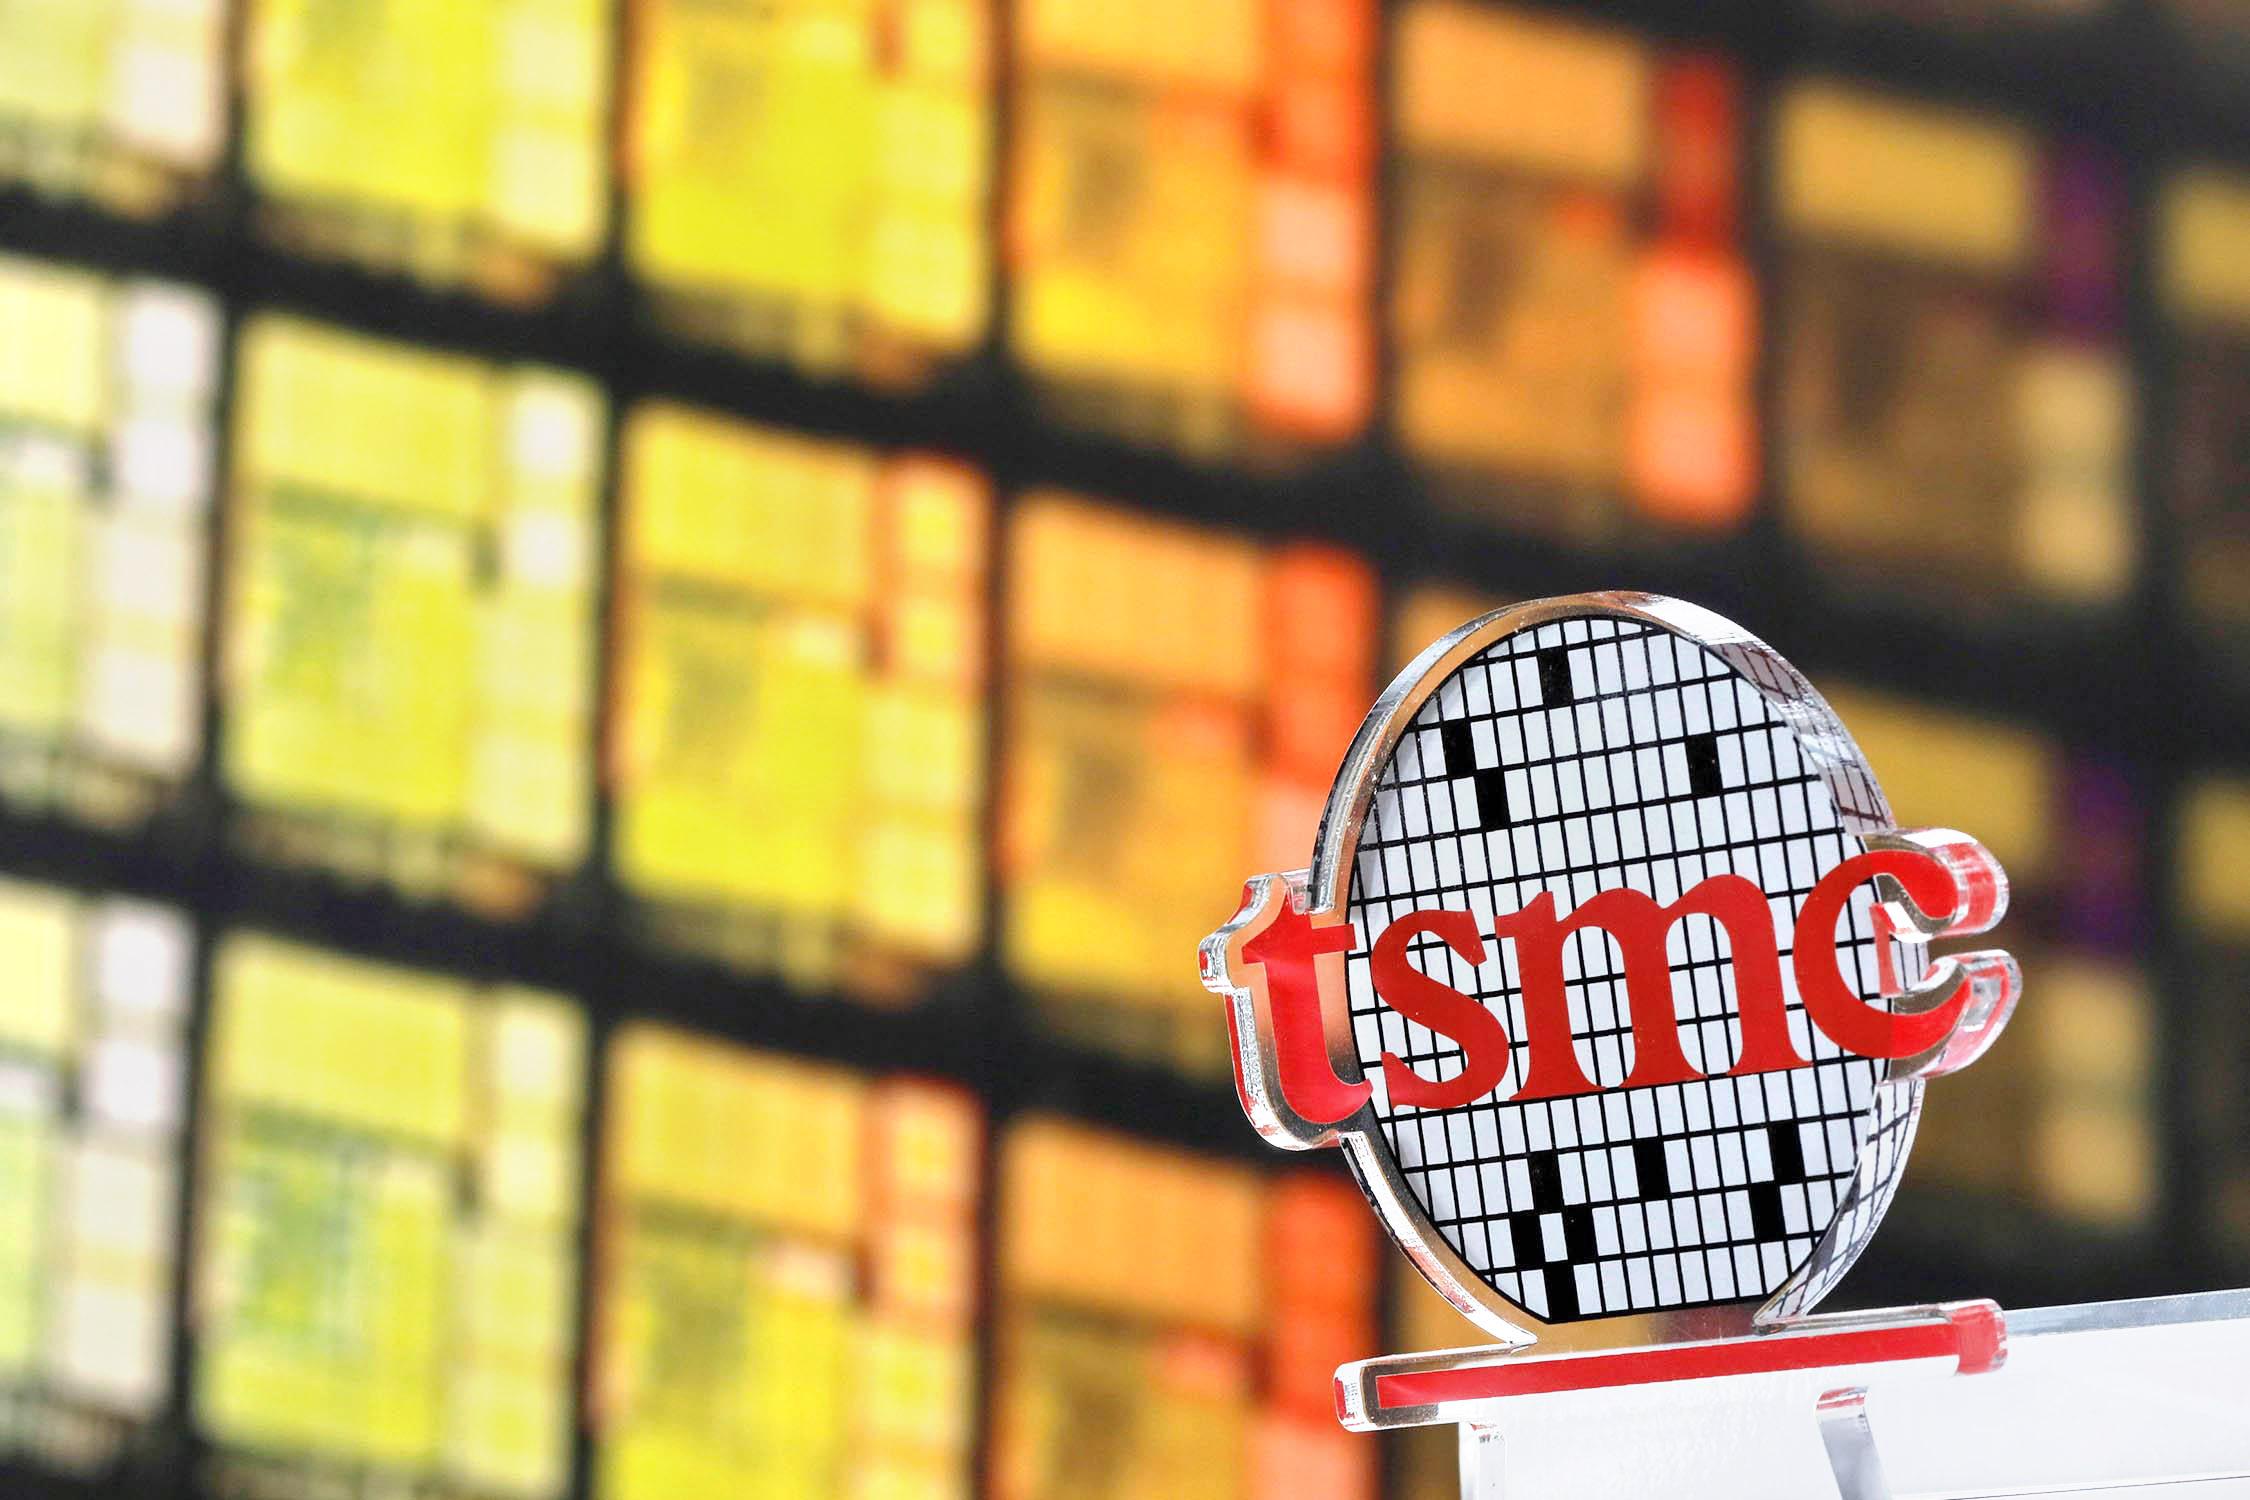 TSMC launches 7nm EUV process to create Zen 3